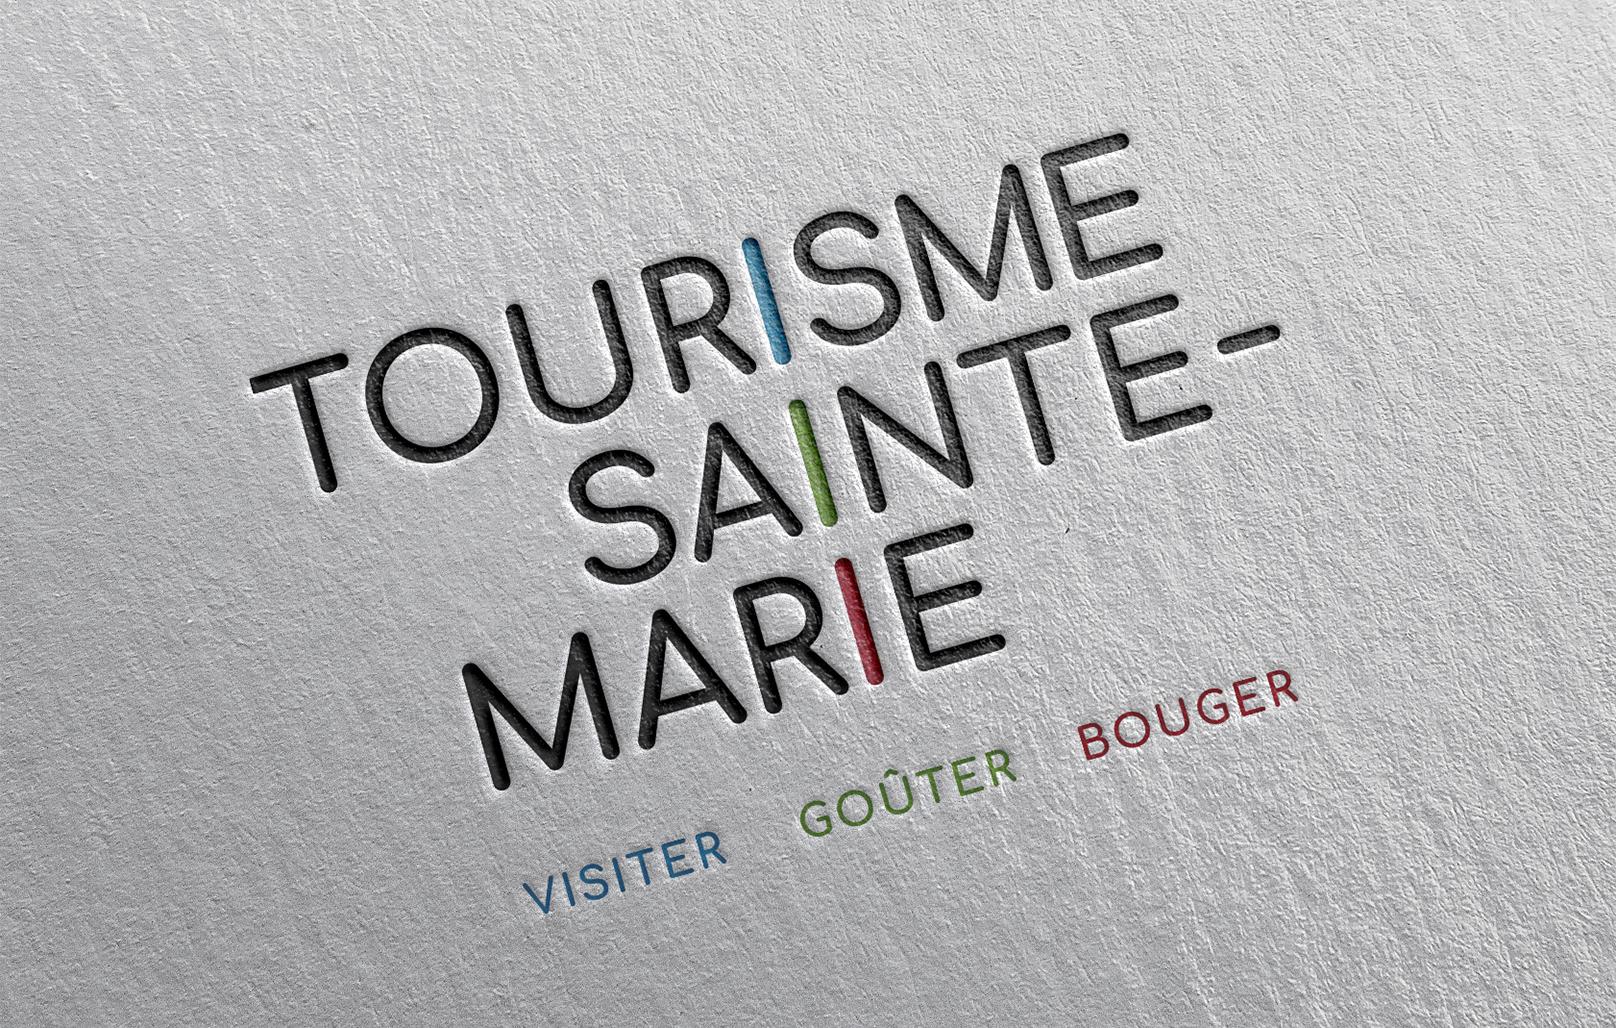 tourisme-sainte-marie-logo